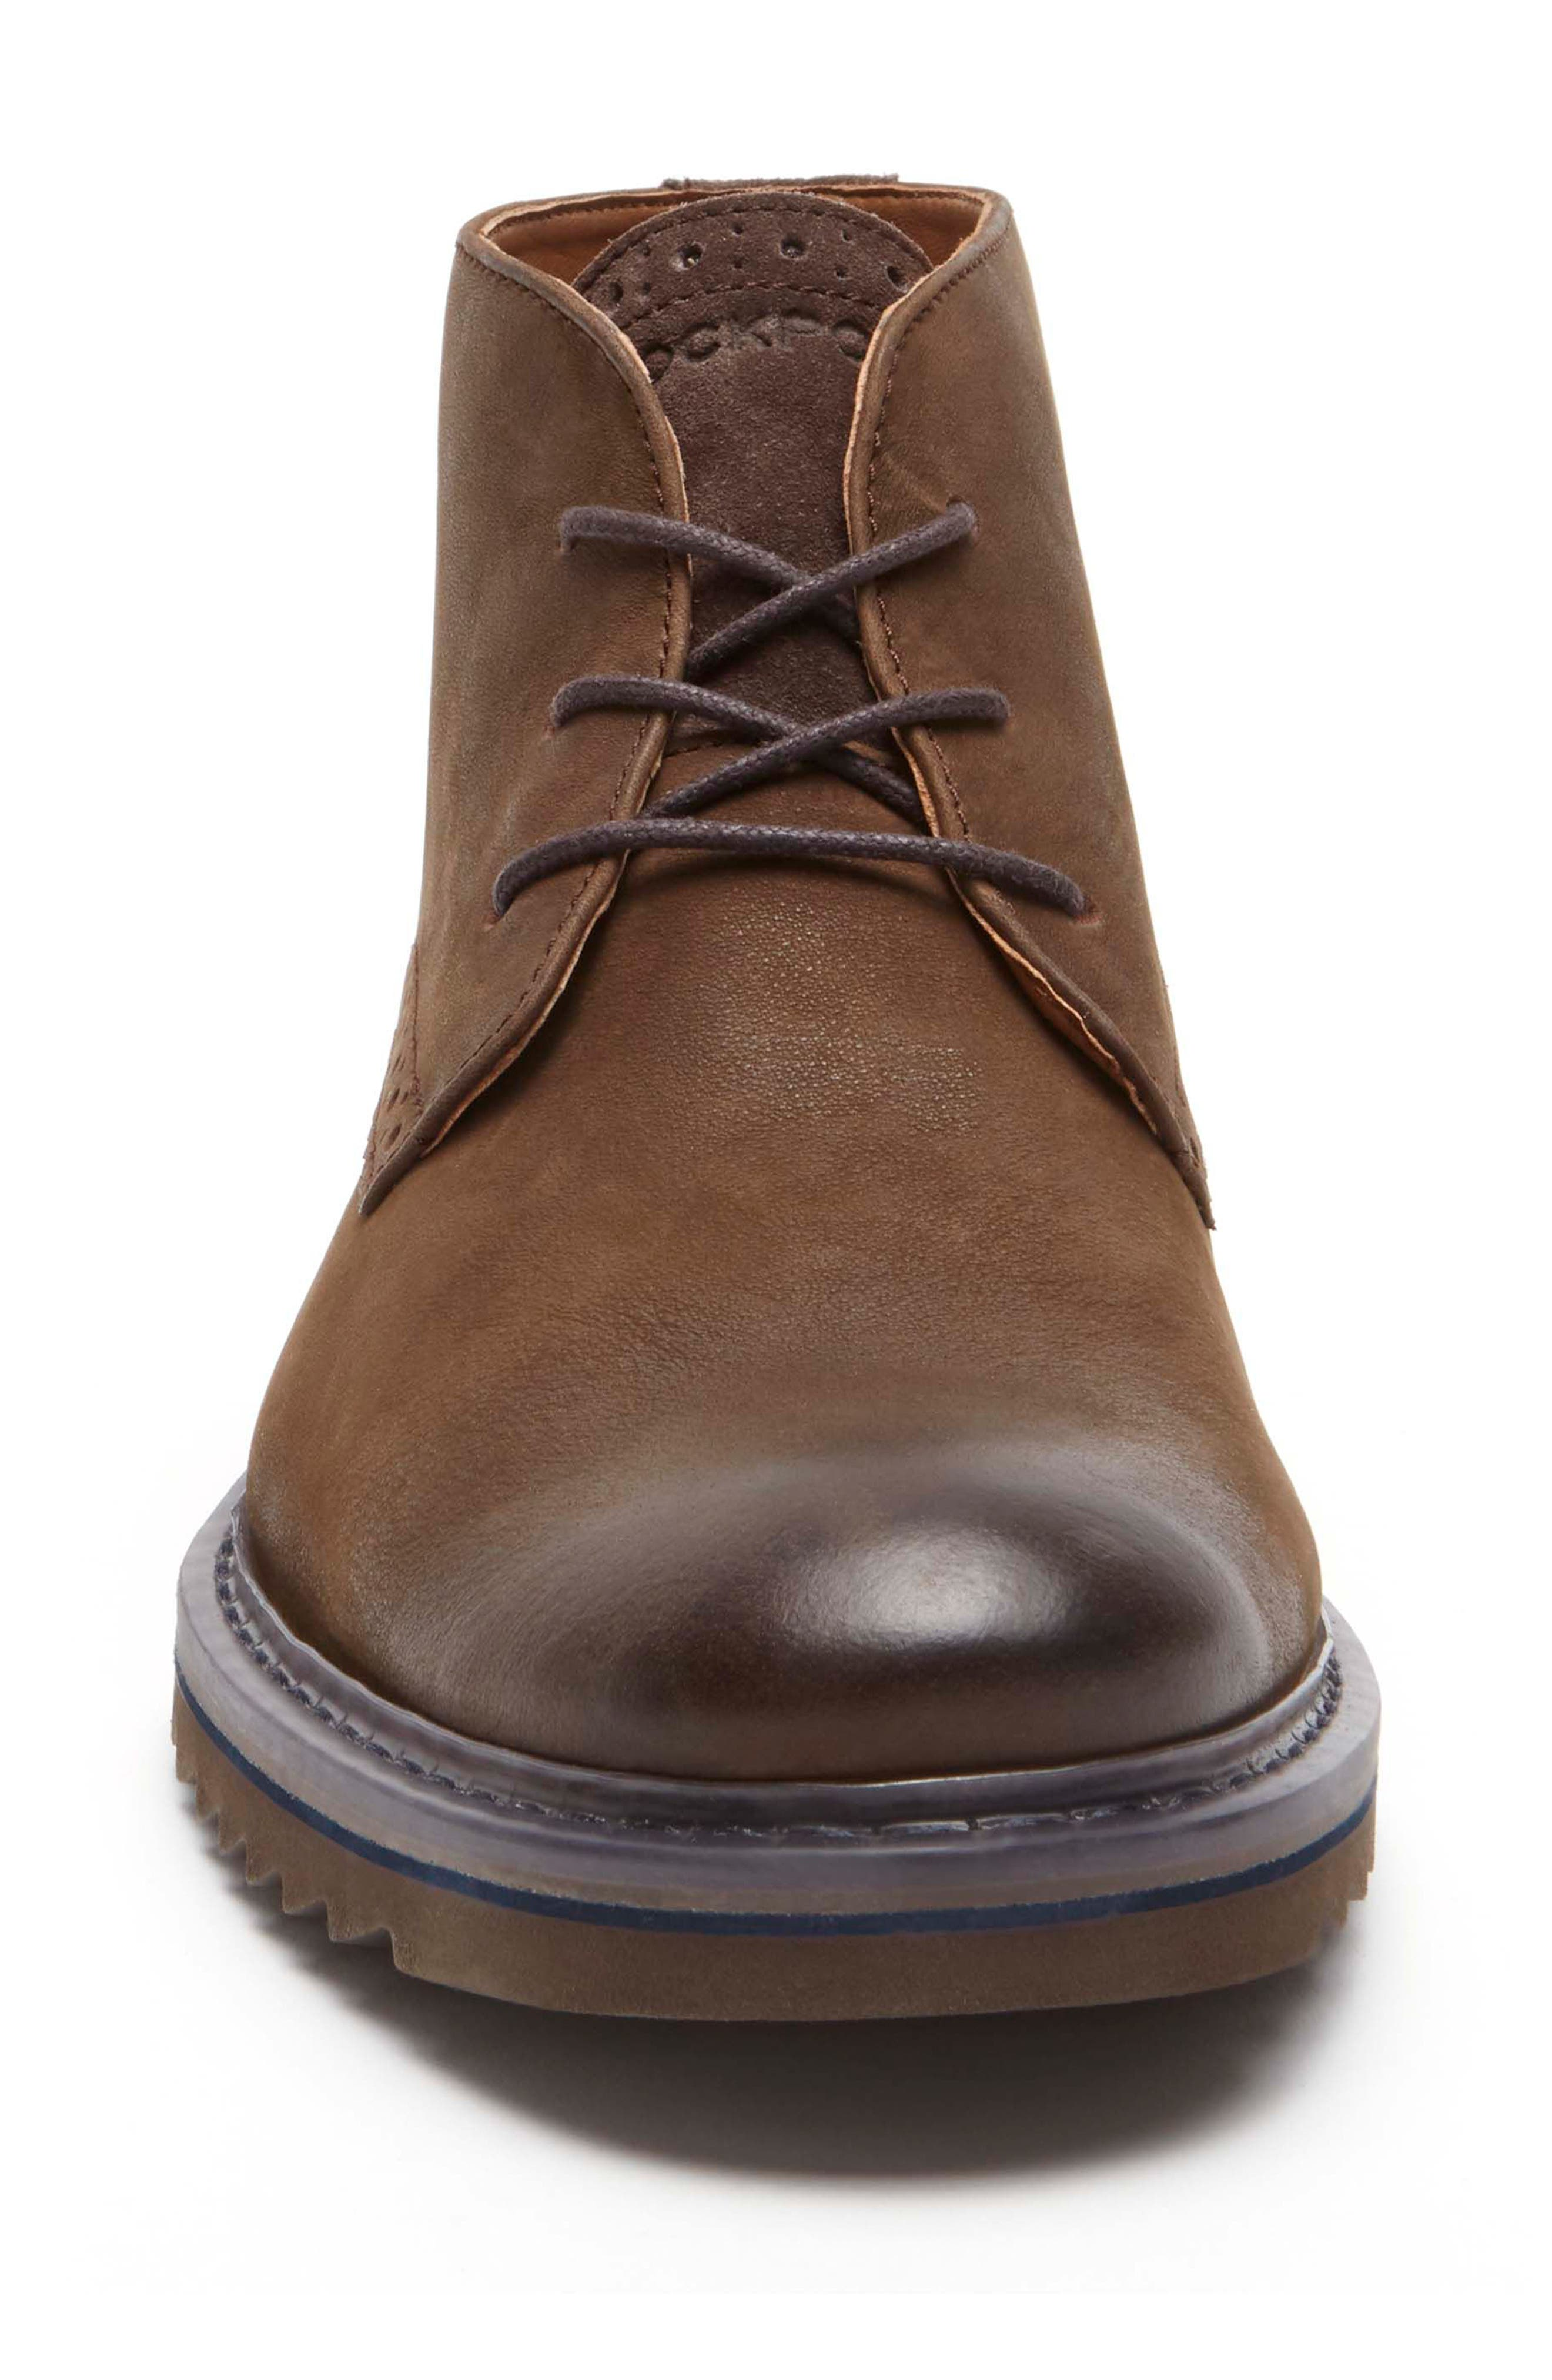 Jaxson Chukka Boot,                             Alternate thumbnail 4, color,                             Brown/ Brown Leather